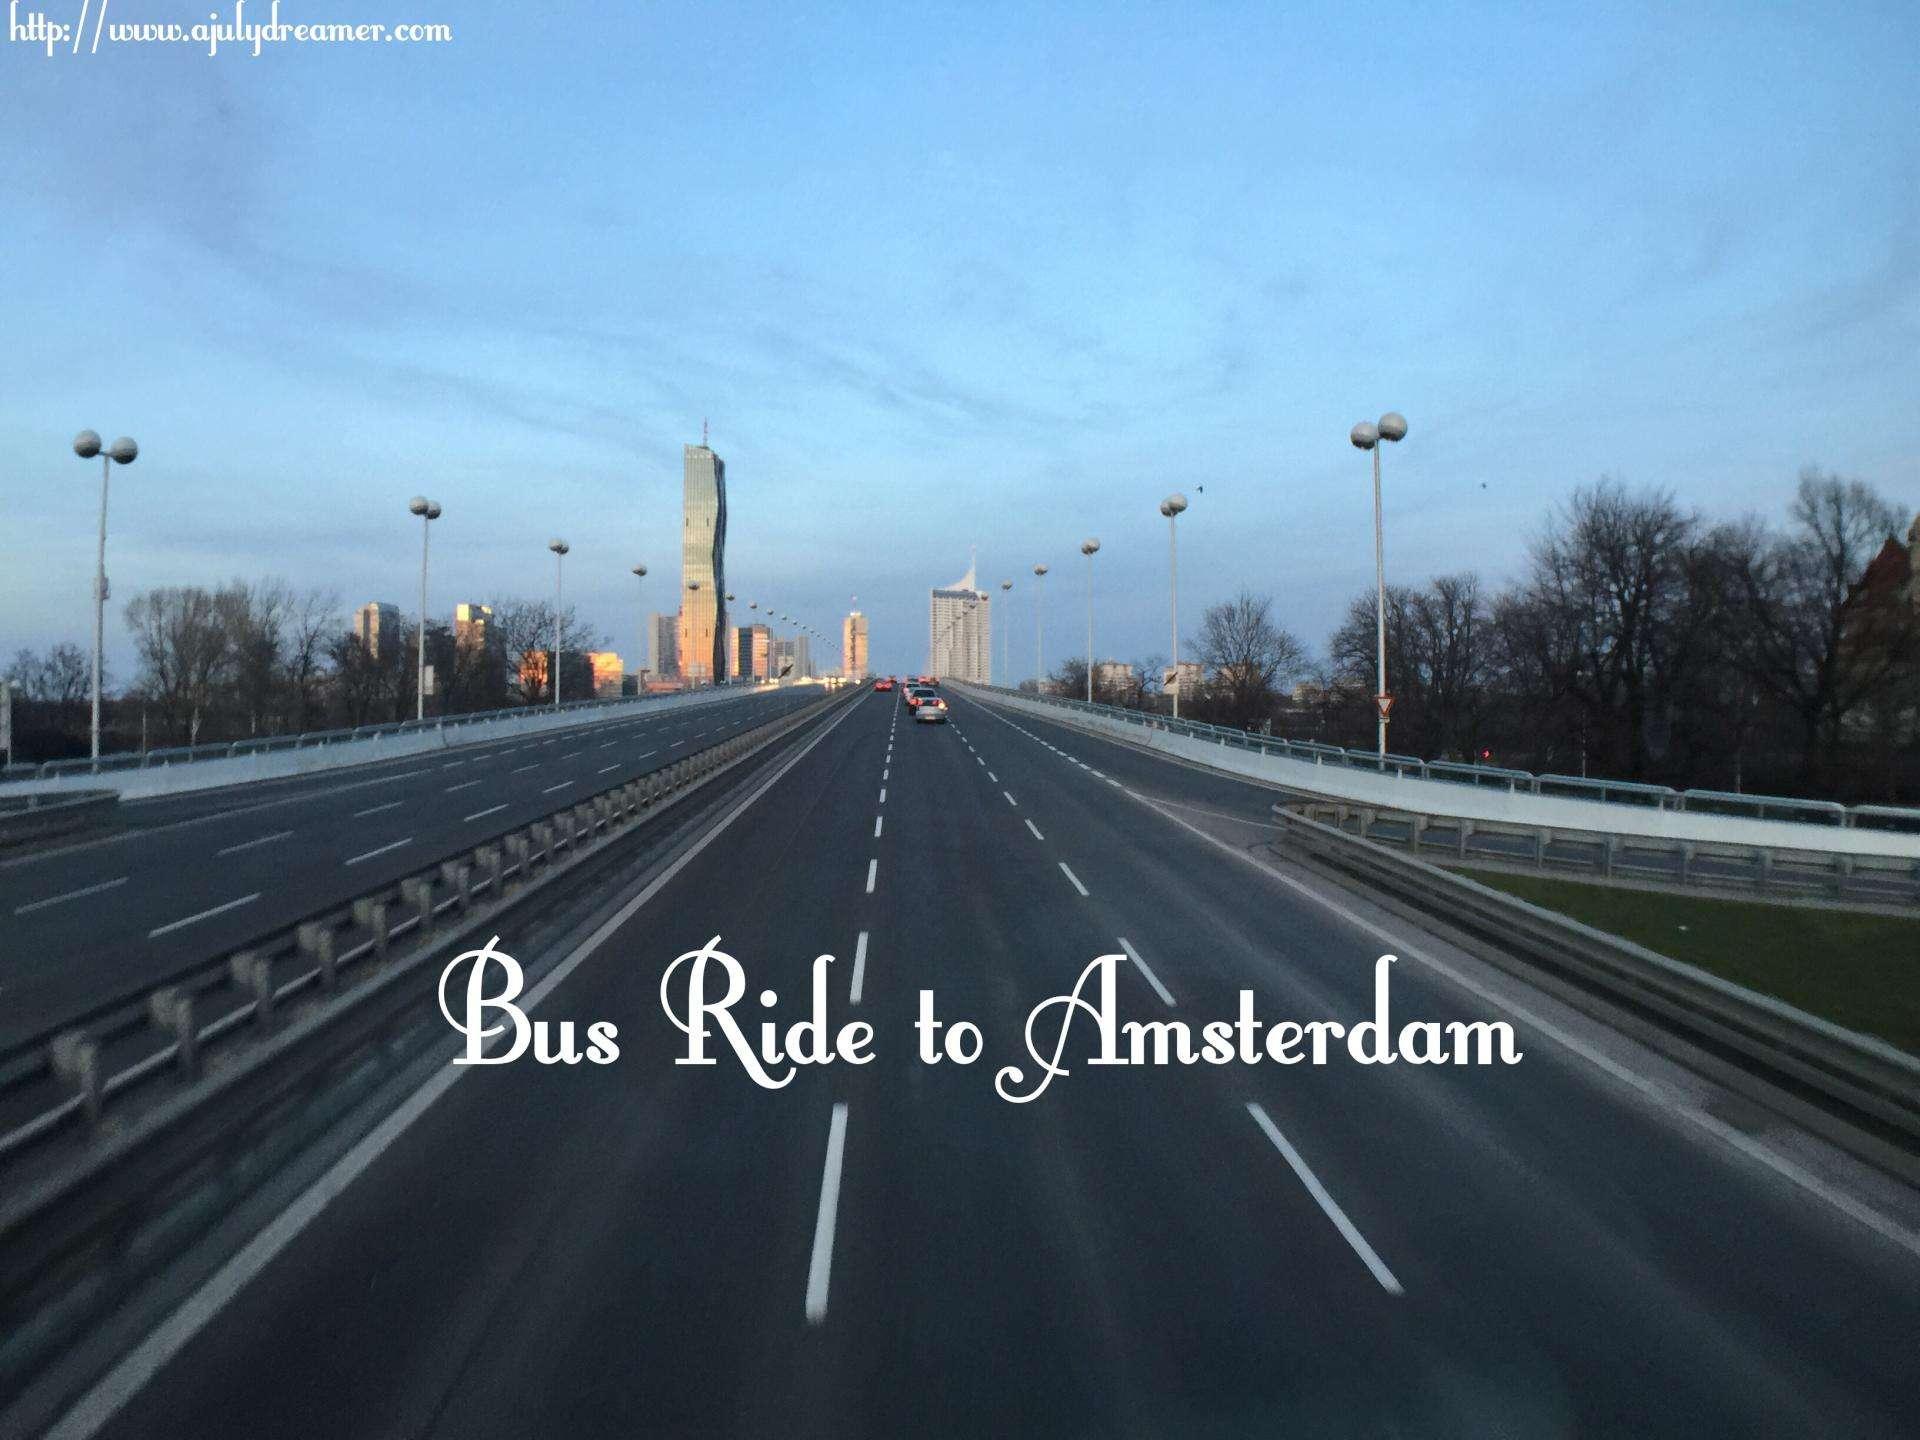 10hr bus ride to Amsterdam